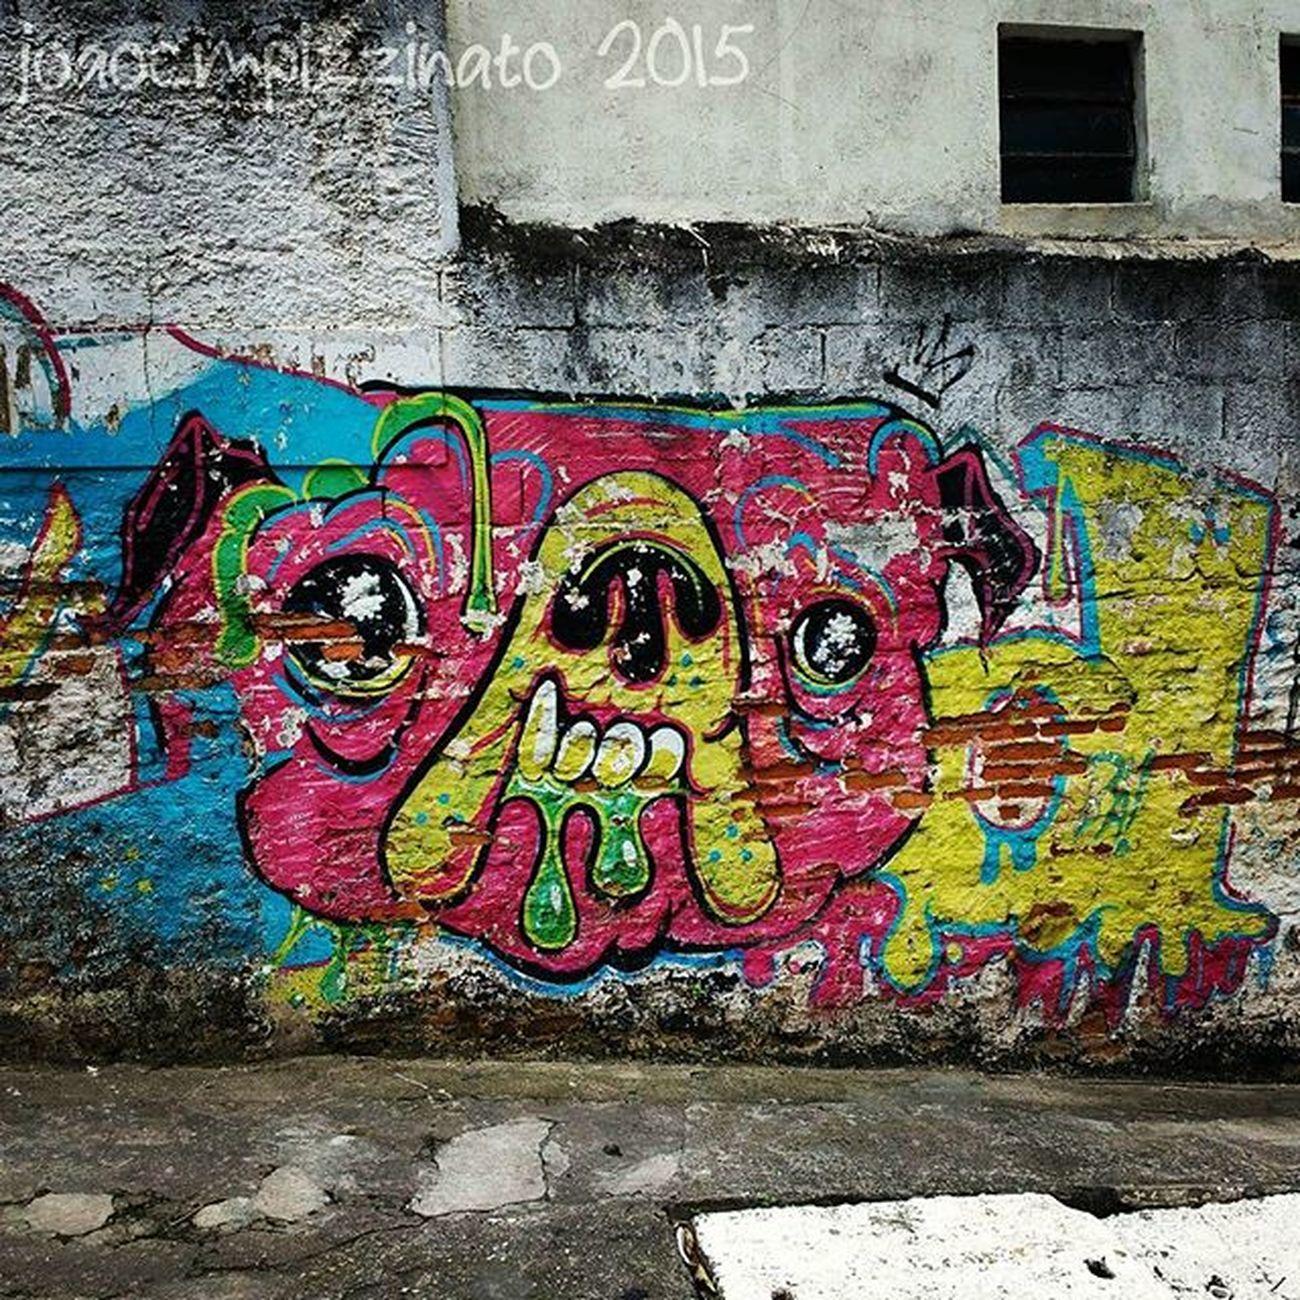 Graffiti Graffitiart Art Streetart UrbanART Streetphotography Urban Streetphoto_brasil Colors City Belavista Saopaulo Brasil Photograph Photography Flaming_abstracts Mundoruasp Olhonaruasp Urbexbrasil Urbexsp Rustlord_texturaunique